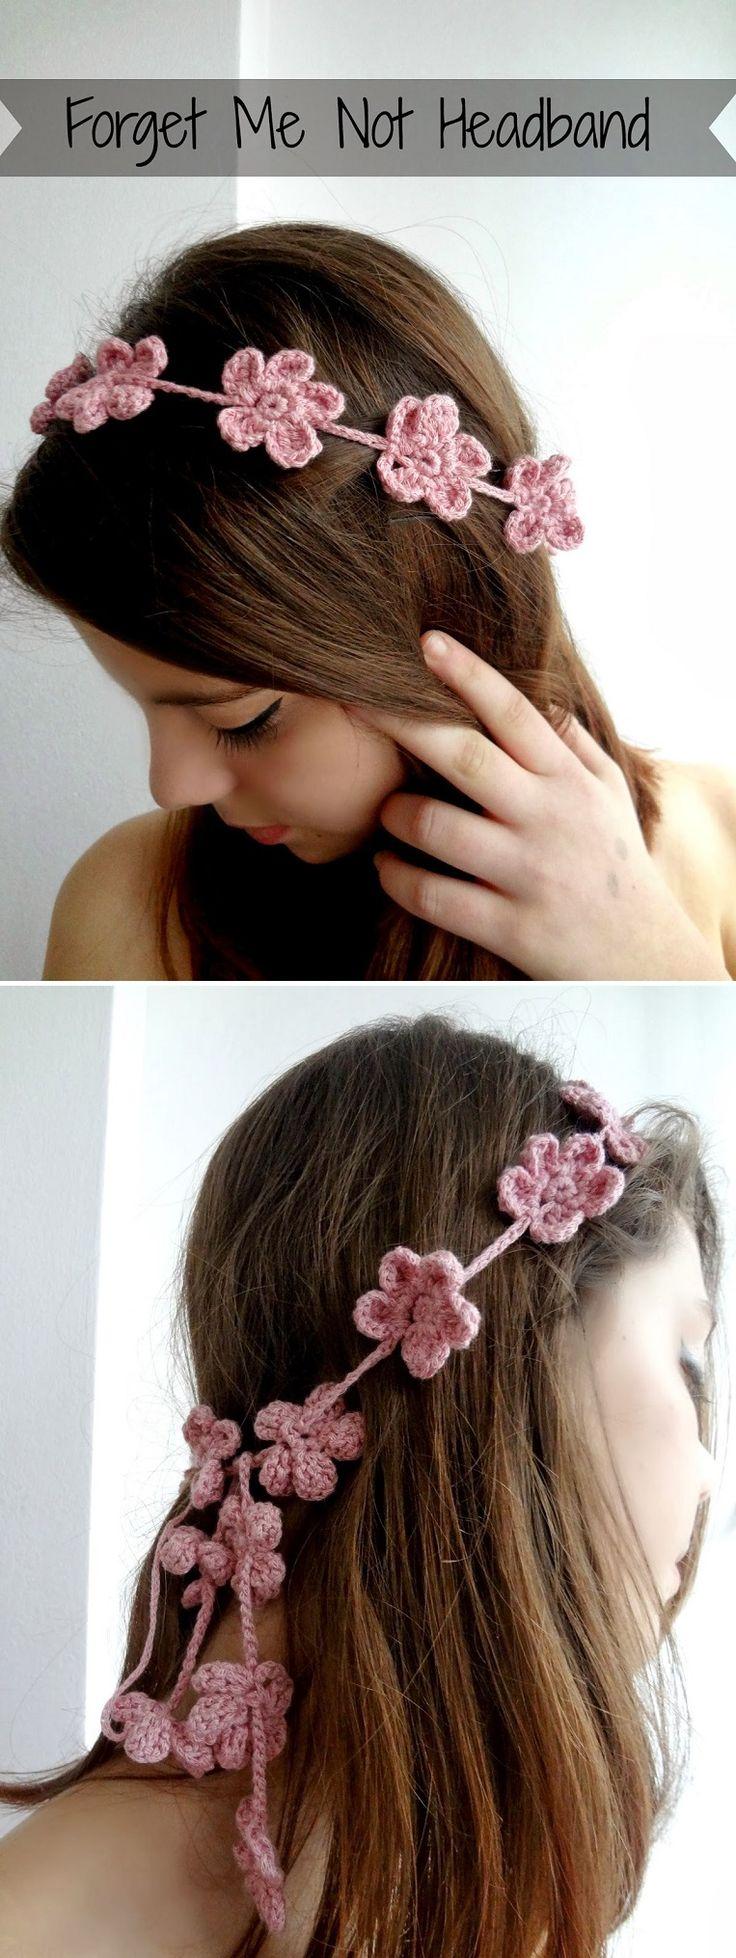 Forget-Me-Not-Headband-free-tutorial.jpg (763×2030)